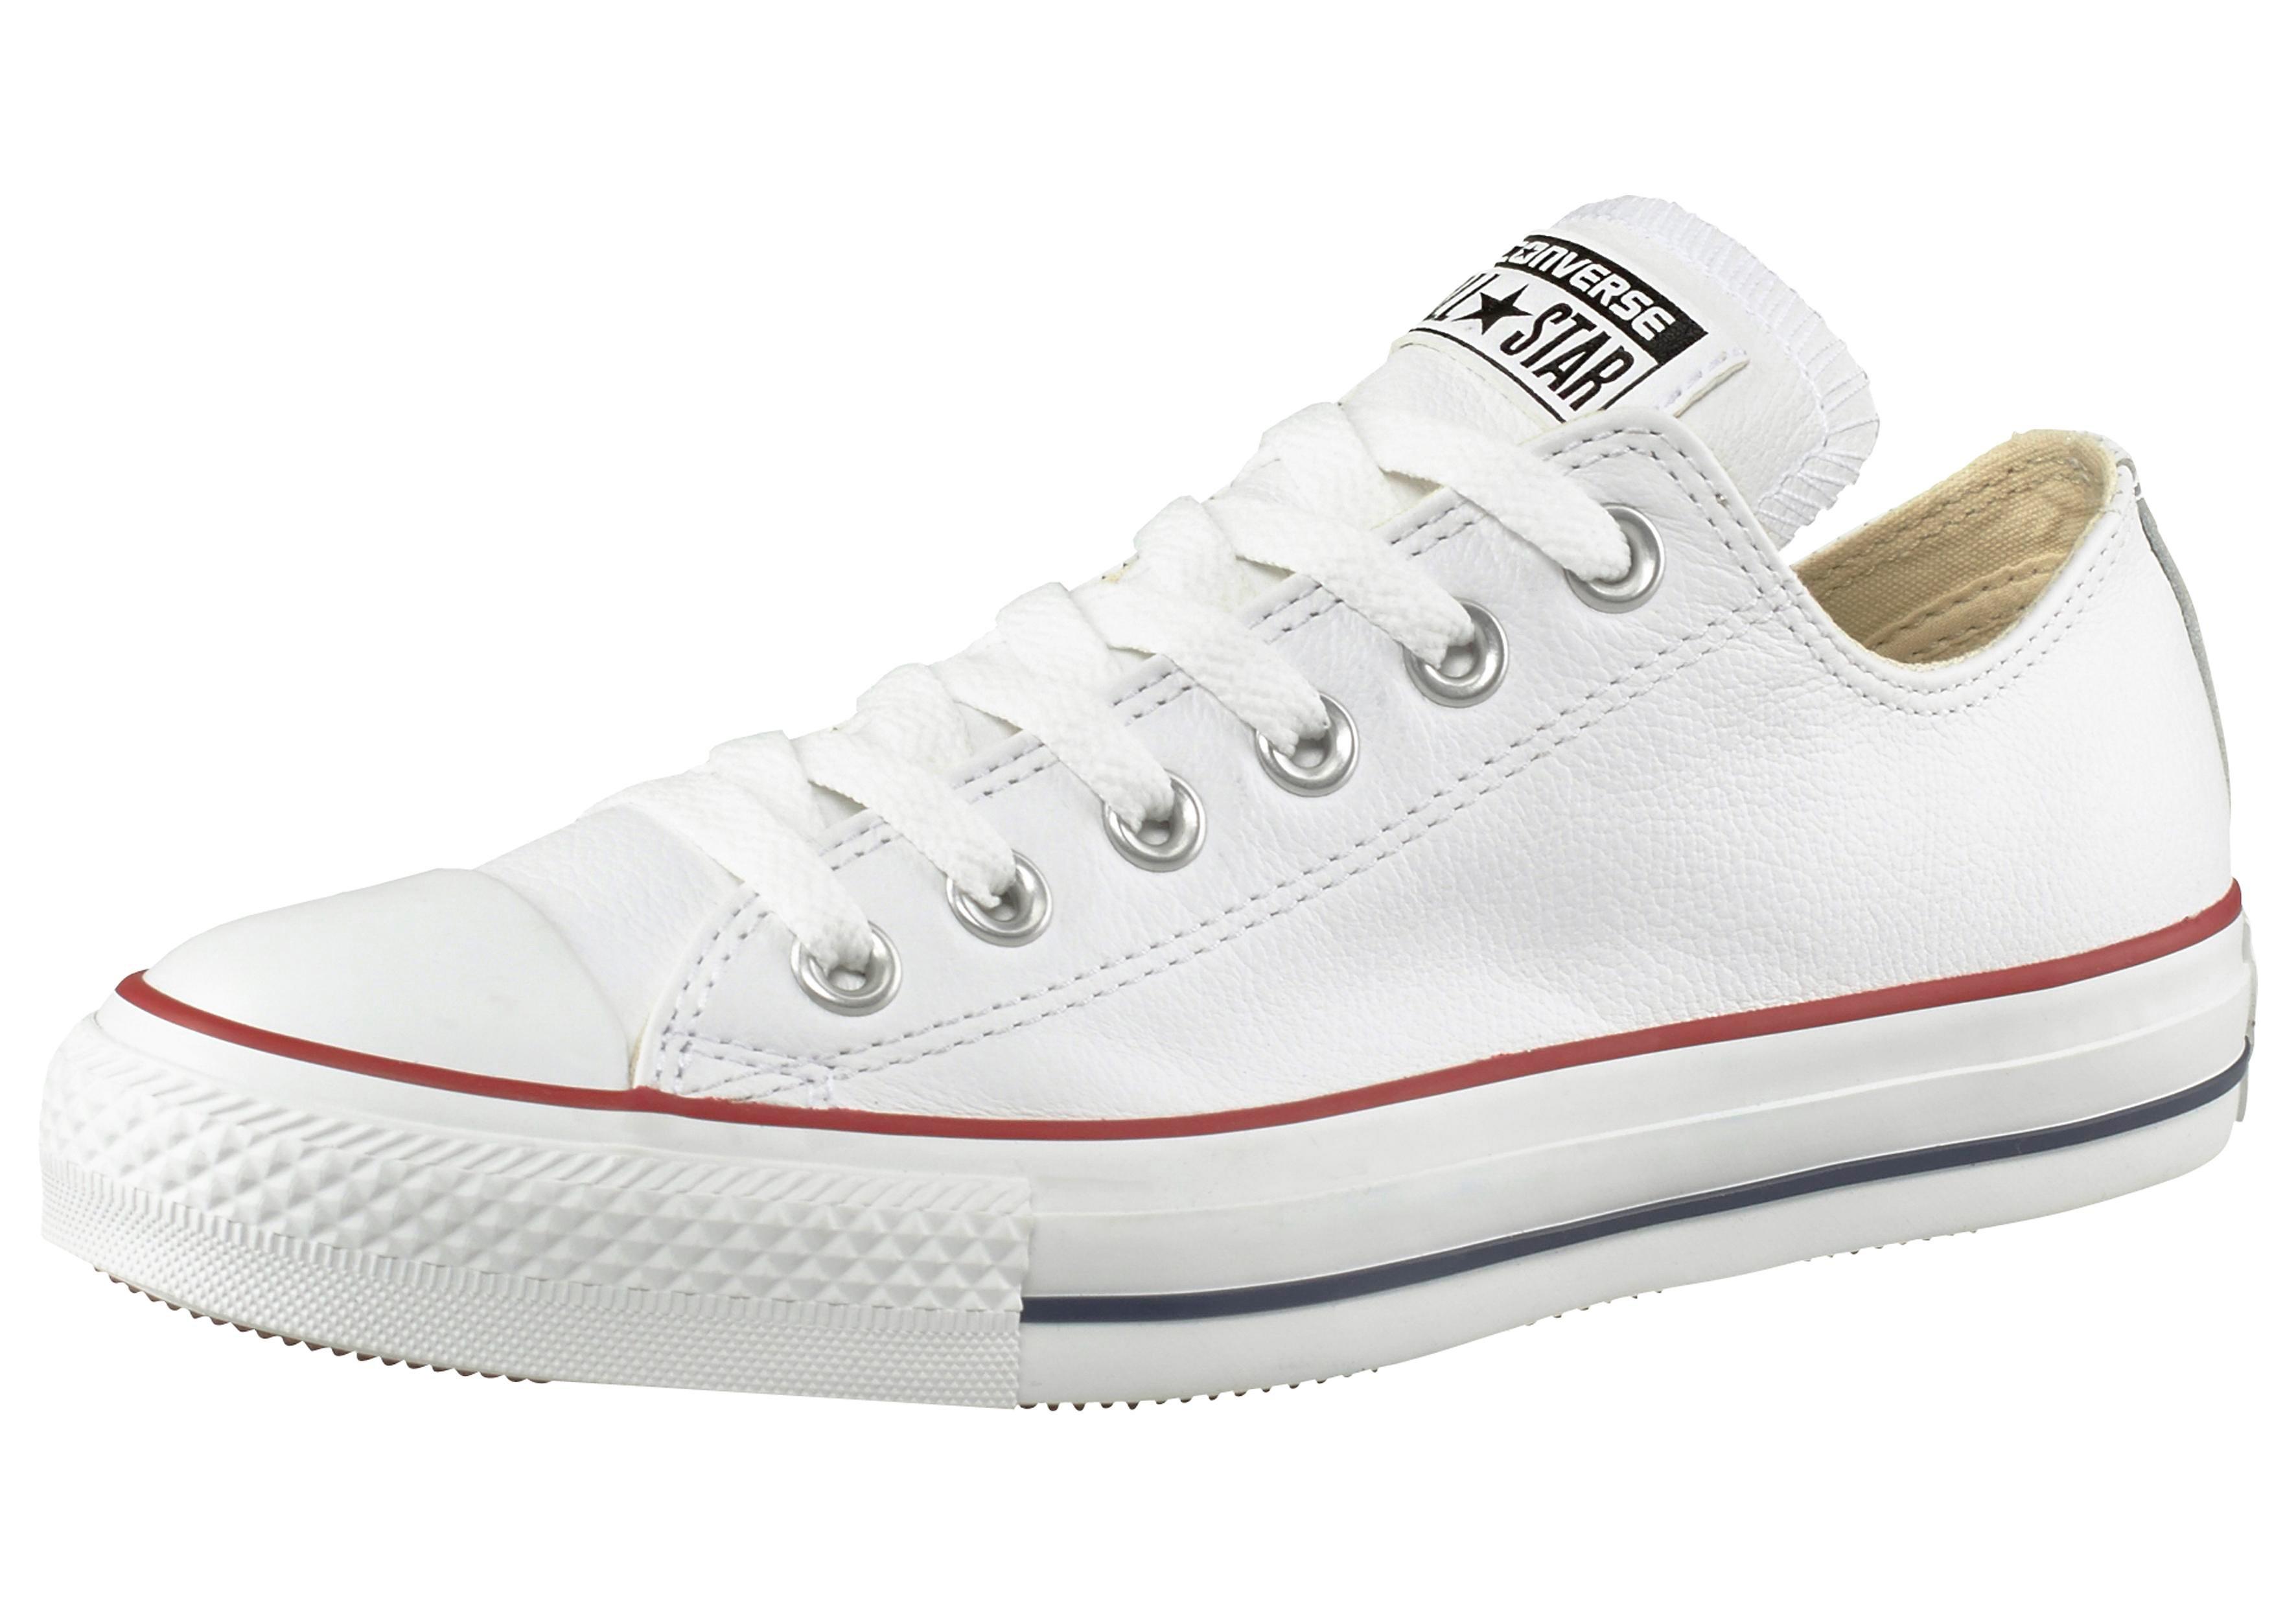 Converse Sneakers All Star Basic Leather Ox - verschillende betaalmethodes